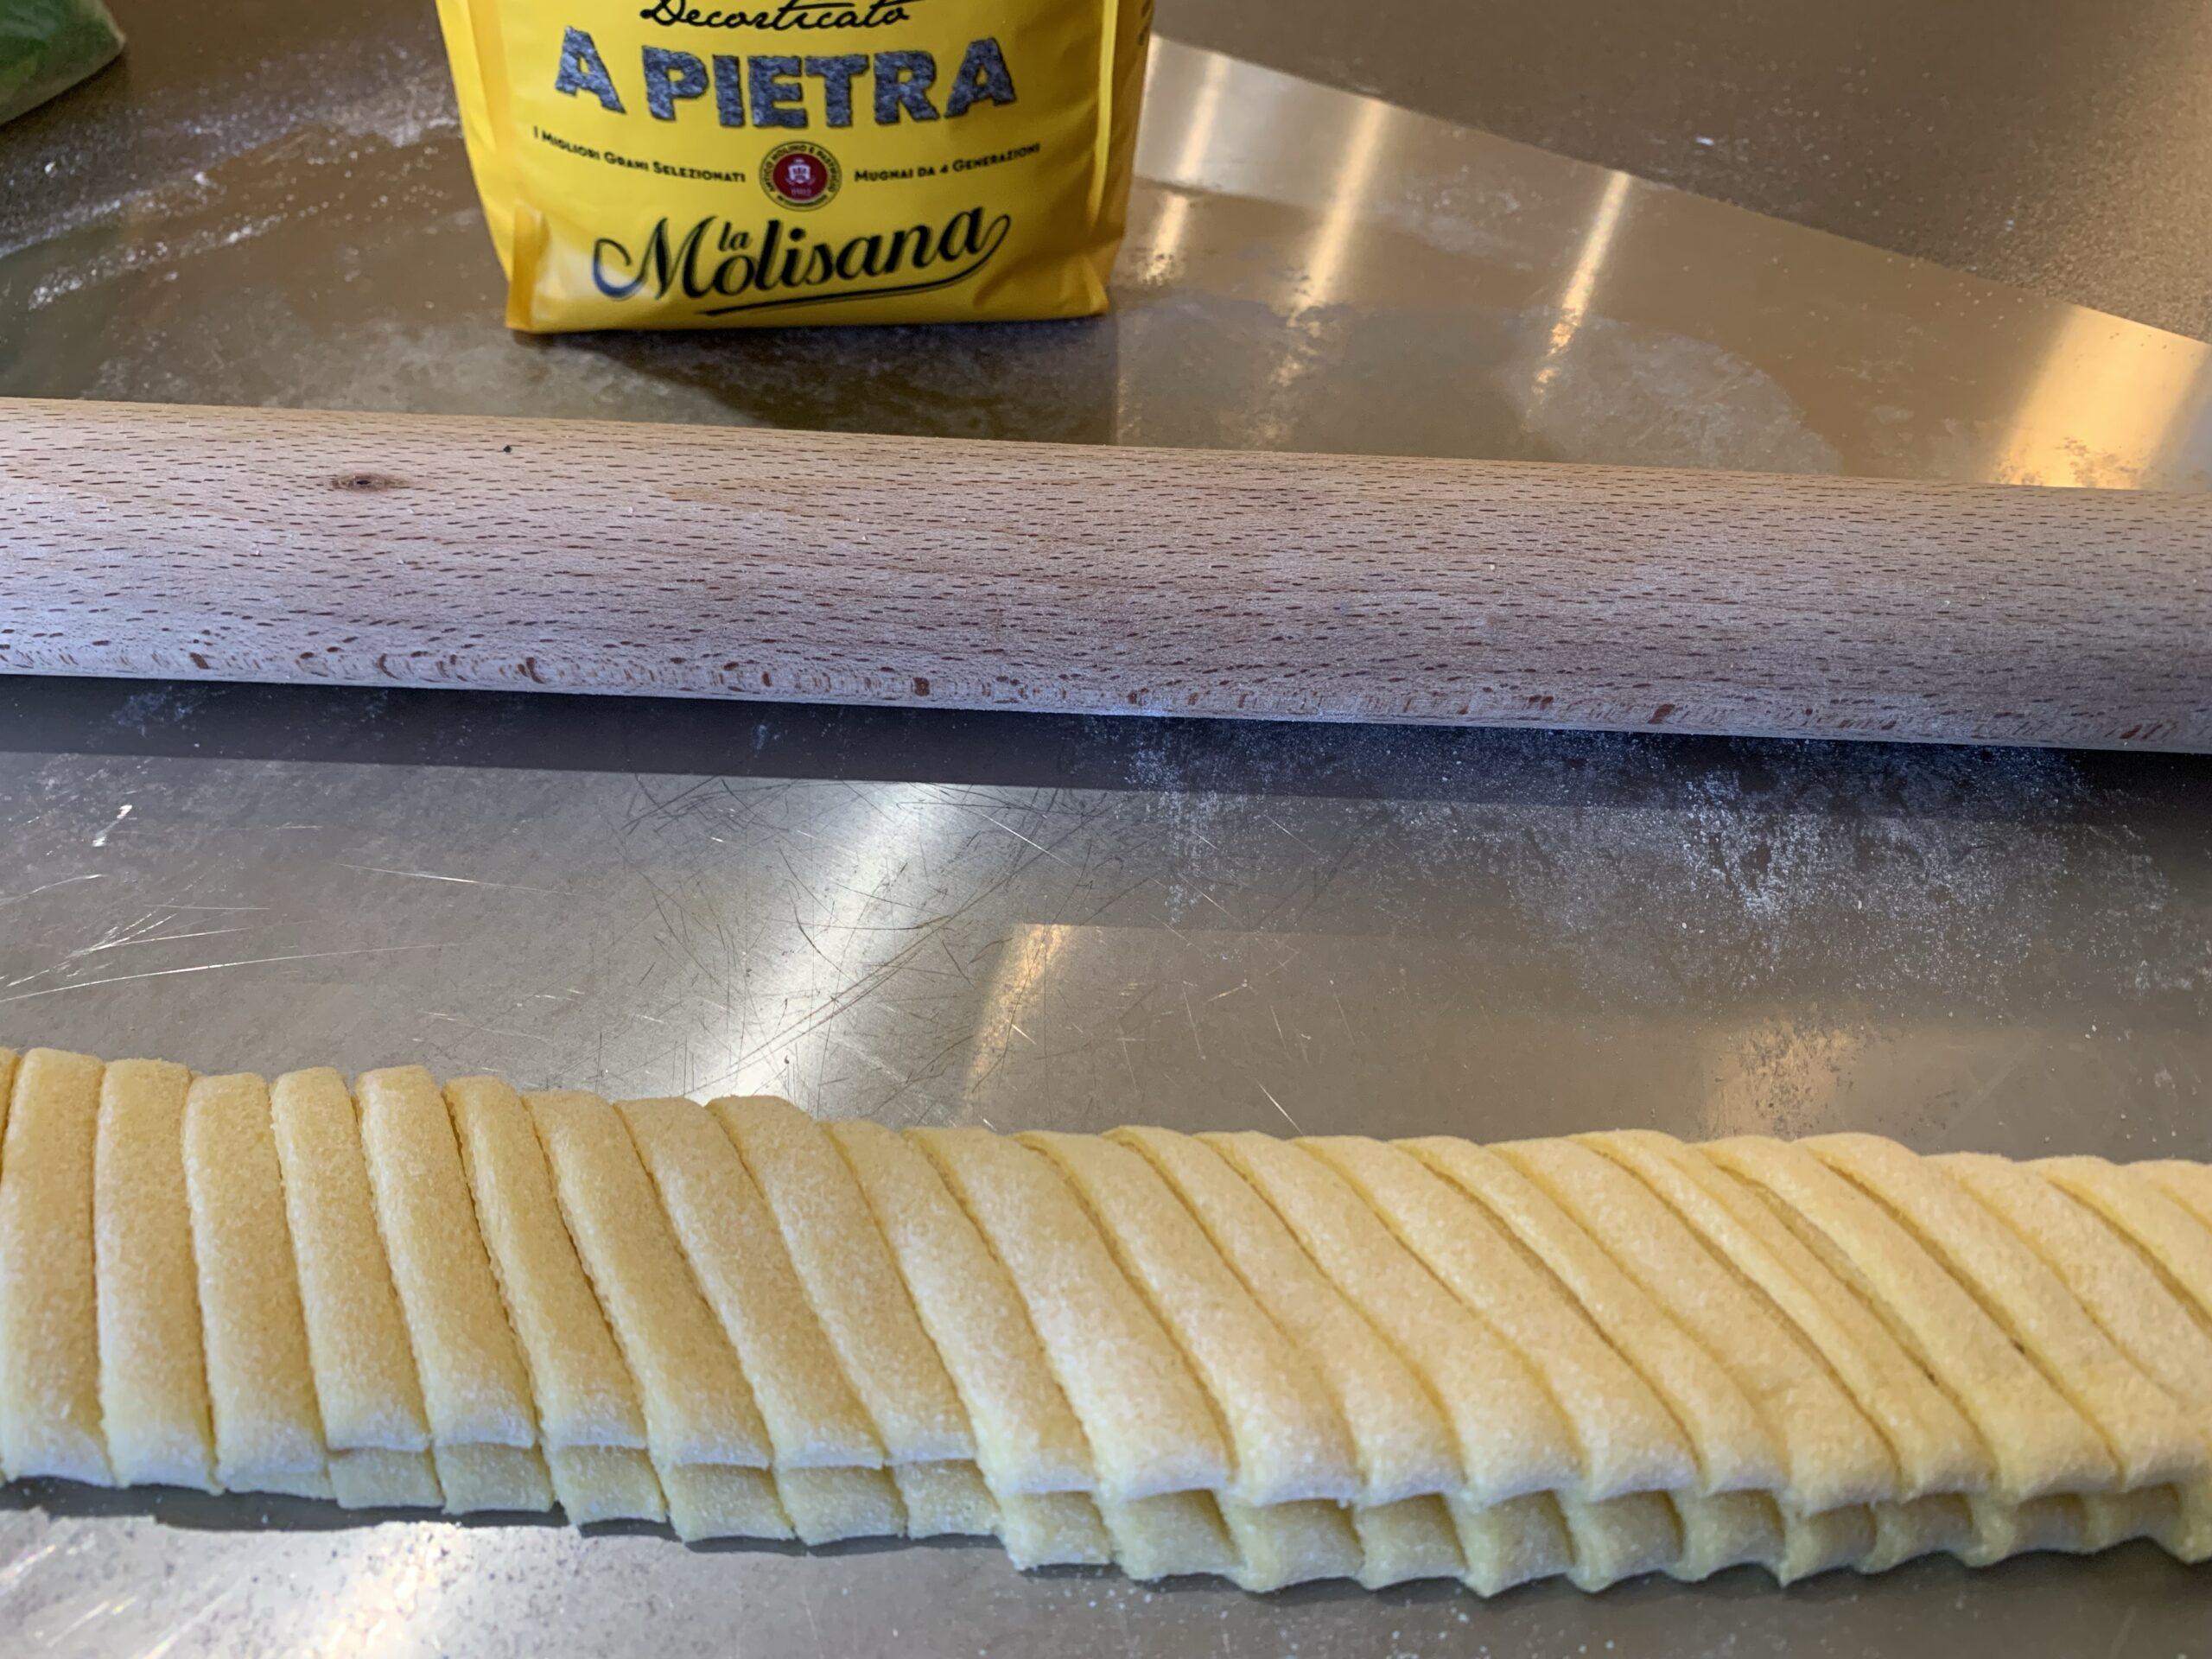 ricetta pasta fresca, pasta all'uovo, pasta ragu, fettuccine al ragu